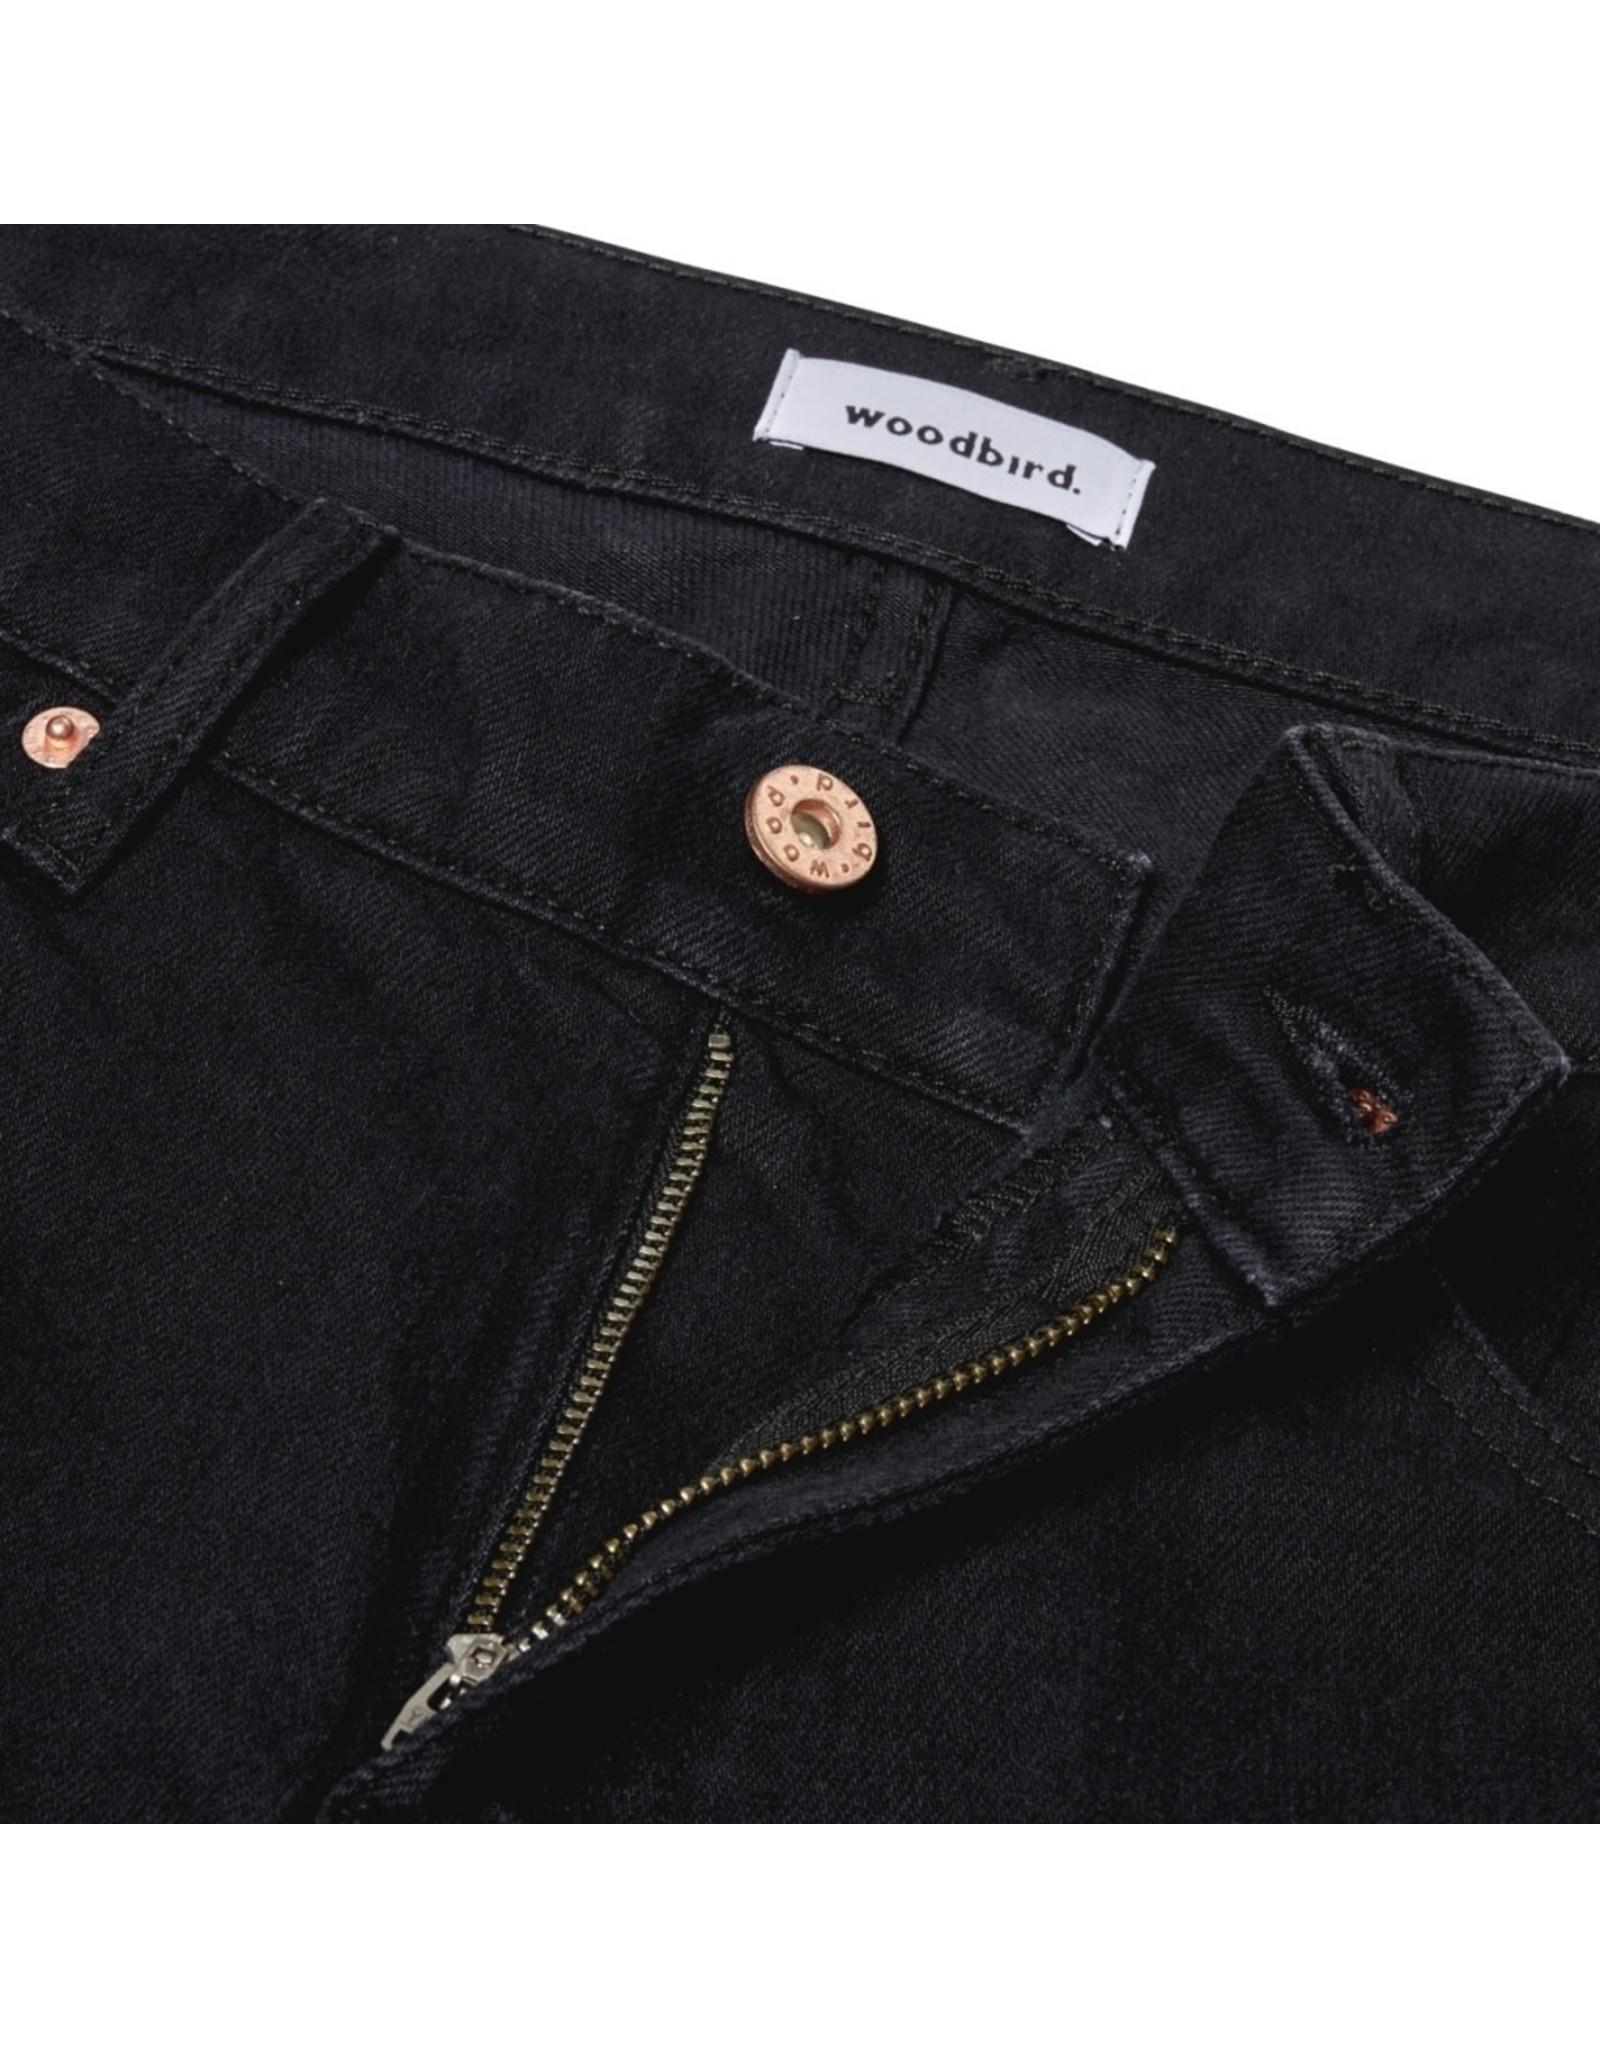 Woodbird Doc Night Jeans